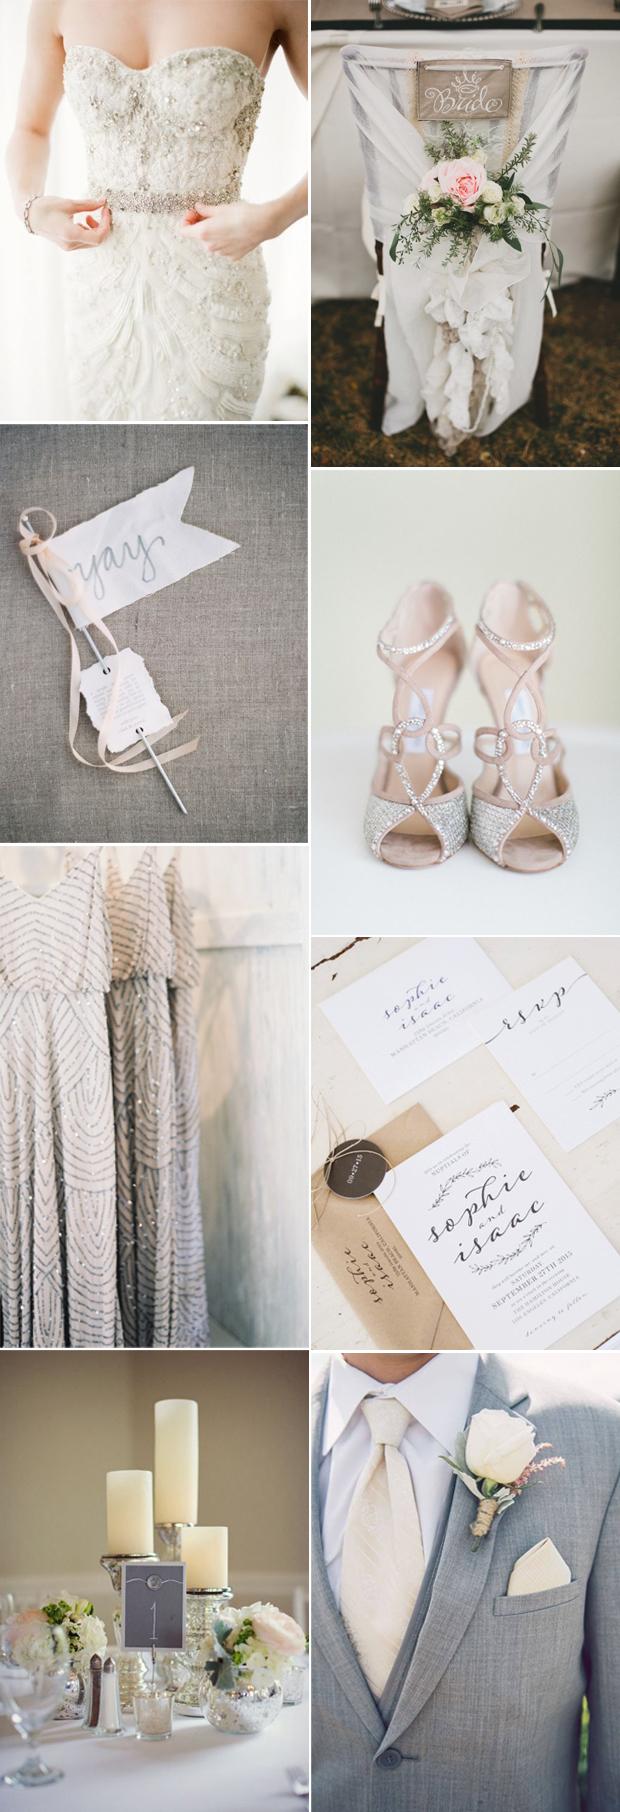 glamorous-nude-grey-silver-blush-wedding-palette